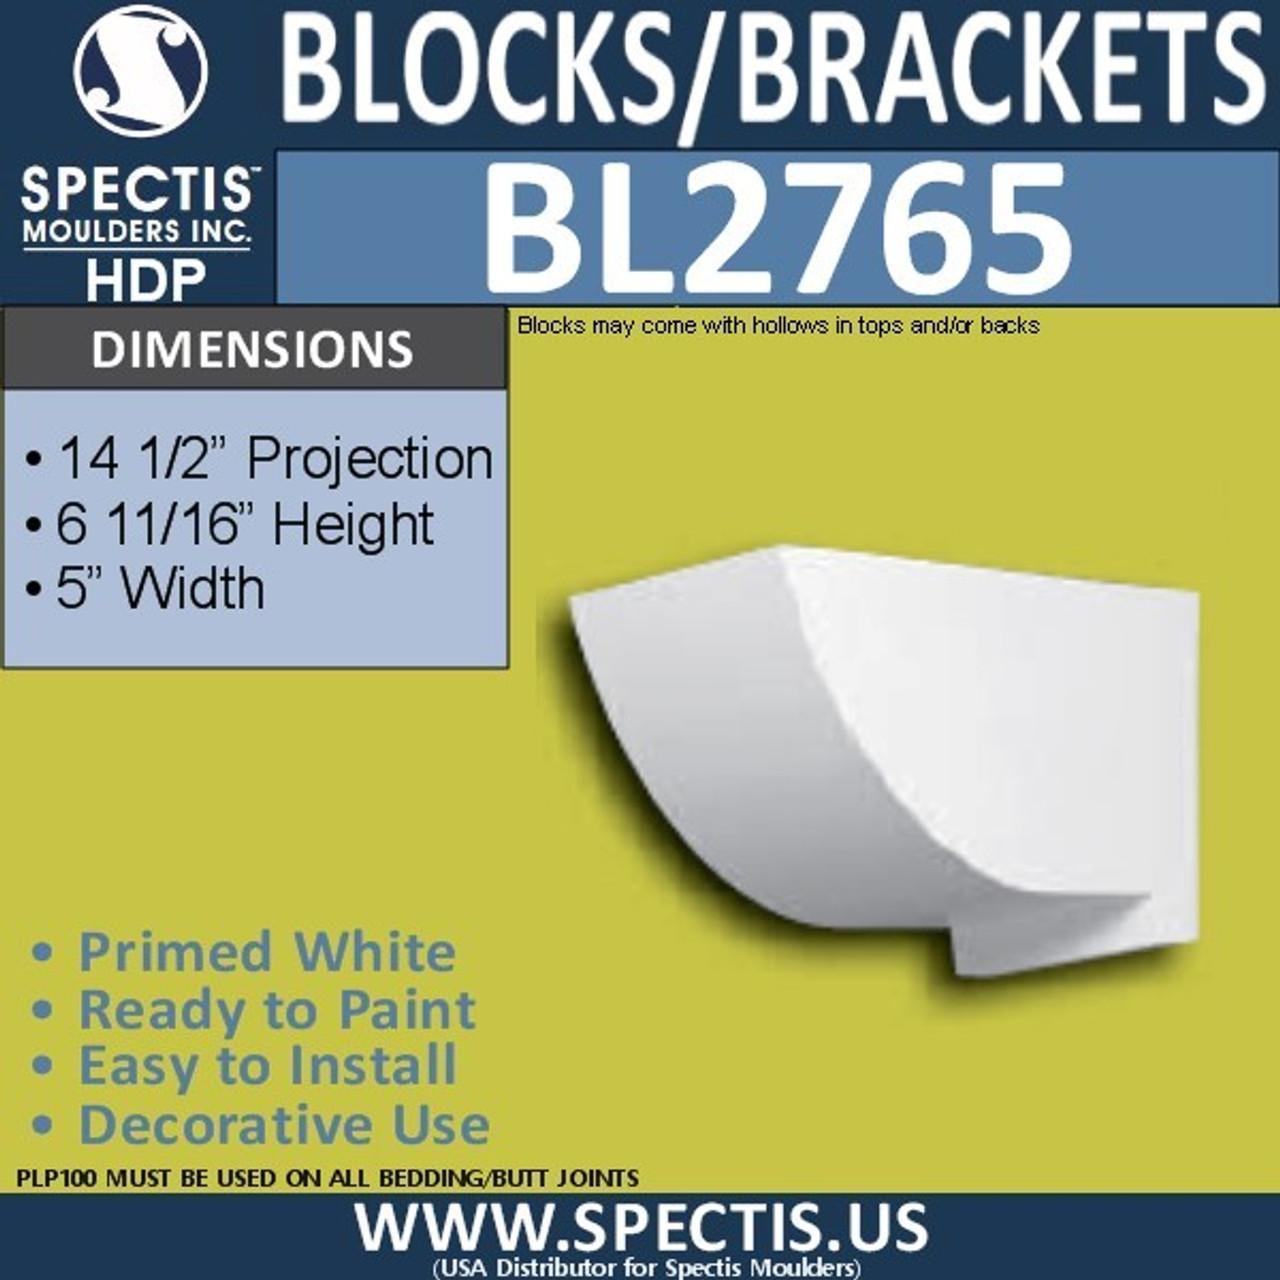 "BL2765 Eave Block or Bracket 5""W x 6.5""H x 14.5"" P"